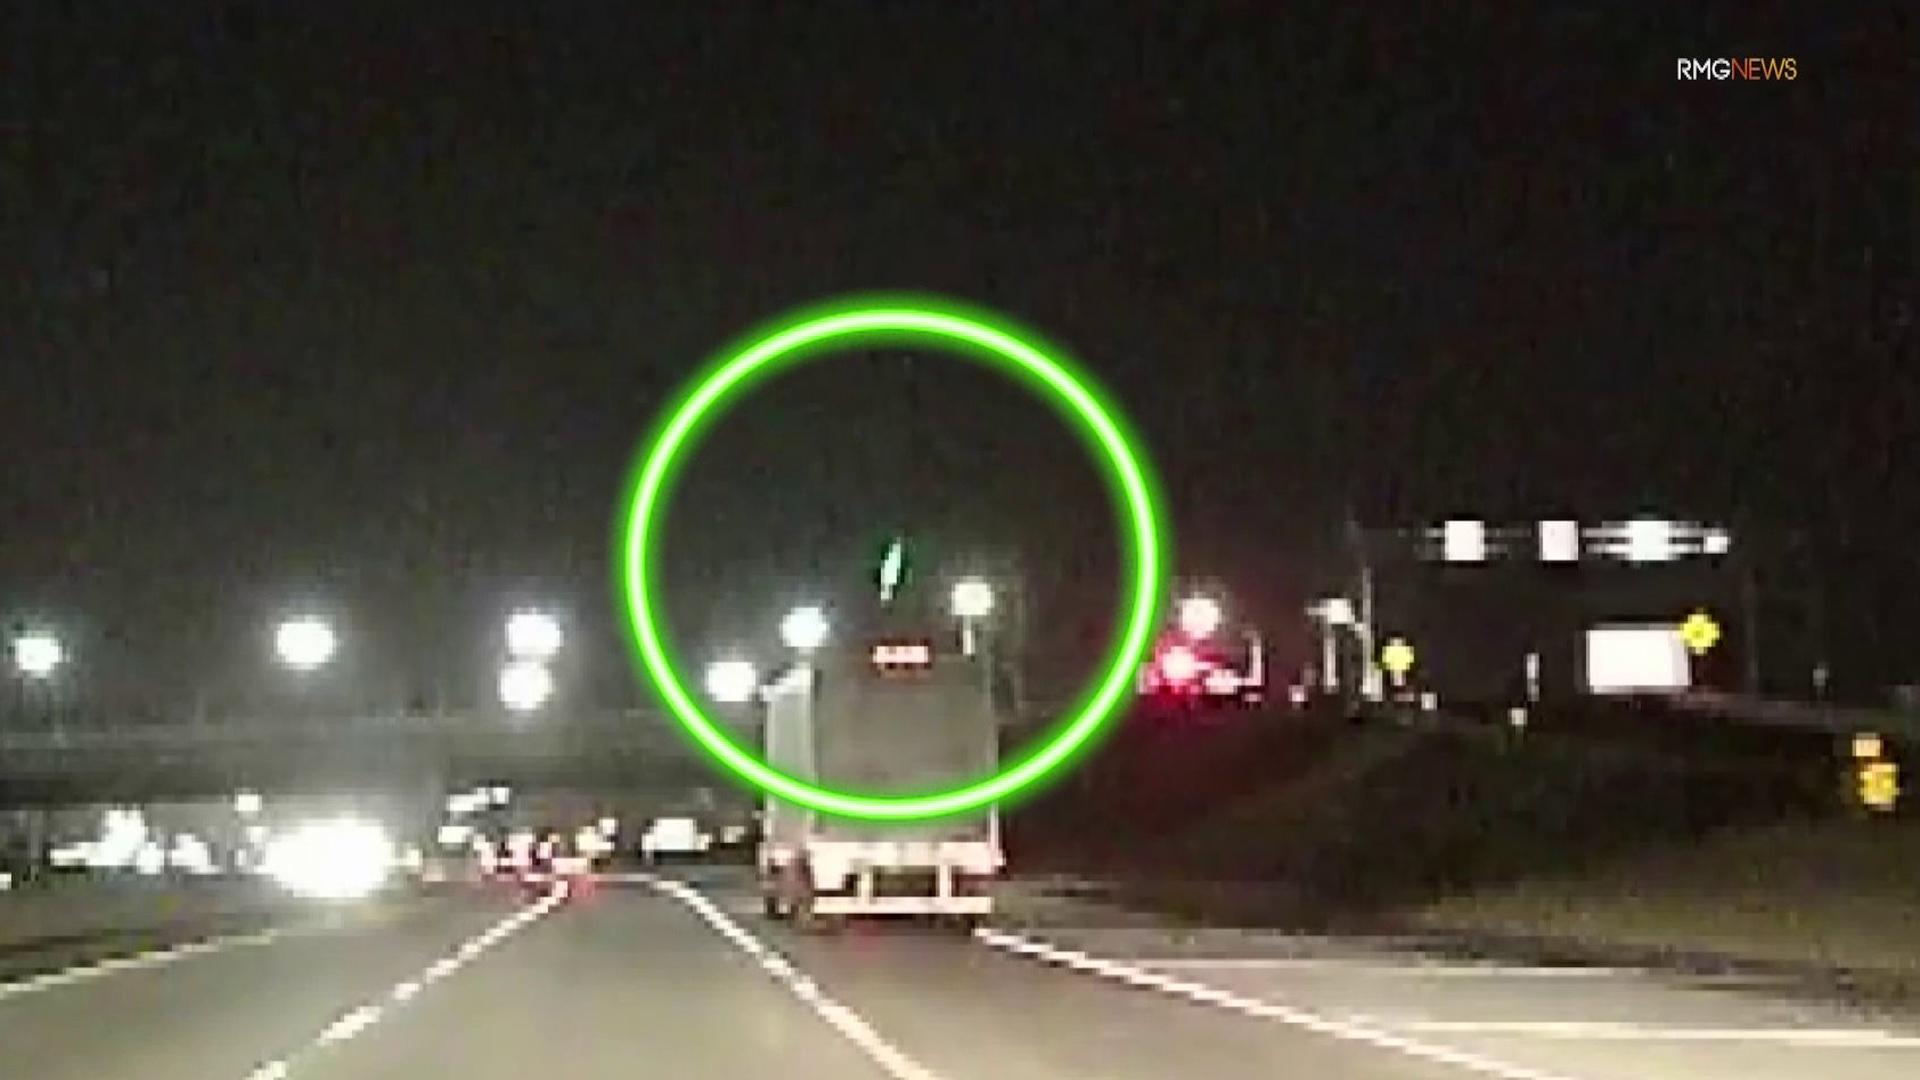 A flash of light is seen over Camarillo on Nov. 25, 2019. (Credit: RMG News)